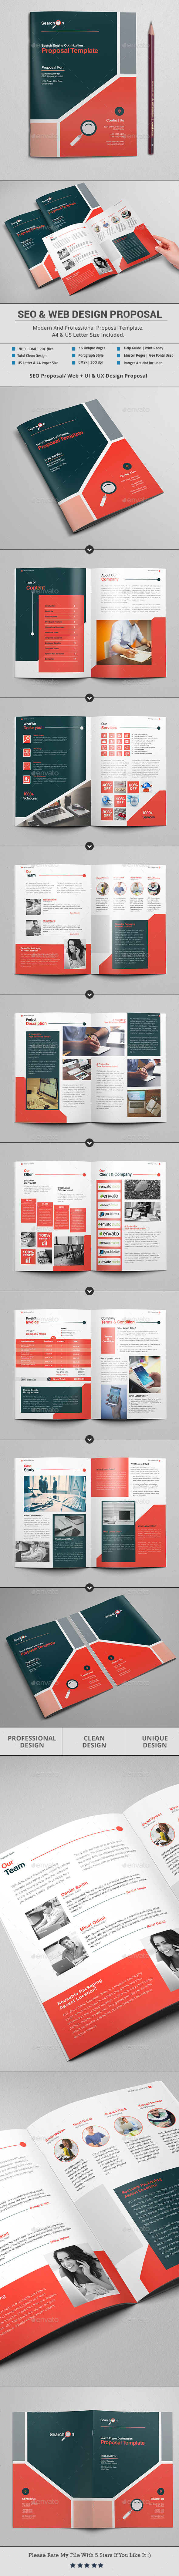 SEO And Web Design Proposal Template by Al-Mamun | GraphicRiver